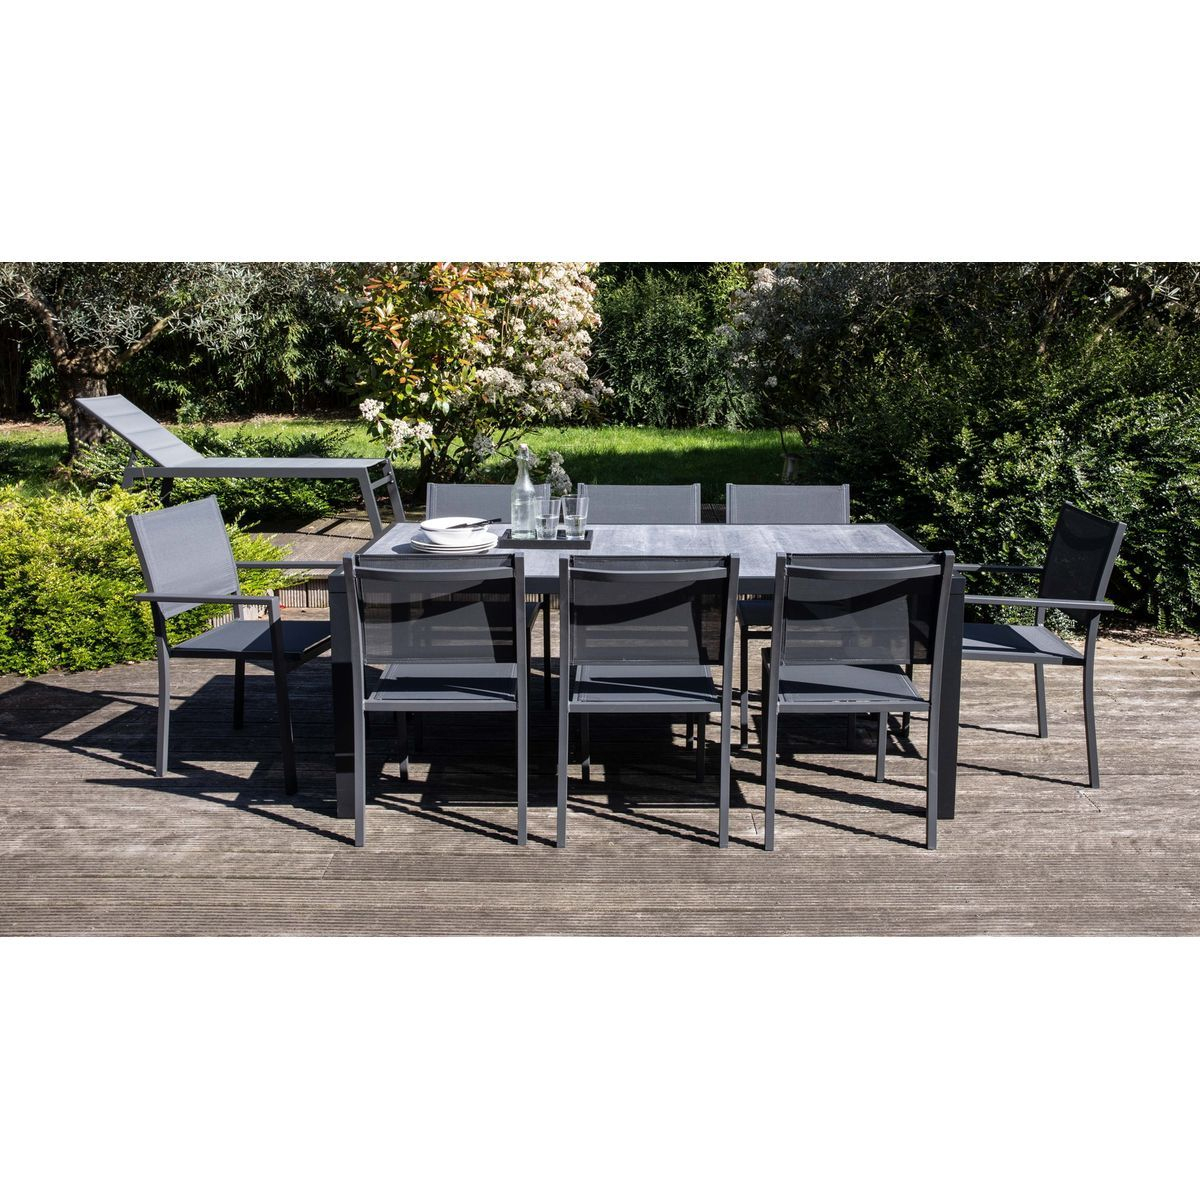 Salon De Jardin Aluminium Et Céramique, 1 Table, 6 Chaises ... concernant Table Céramique Jardin